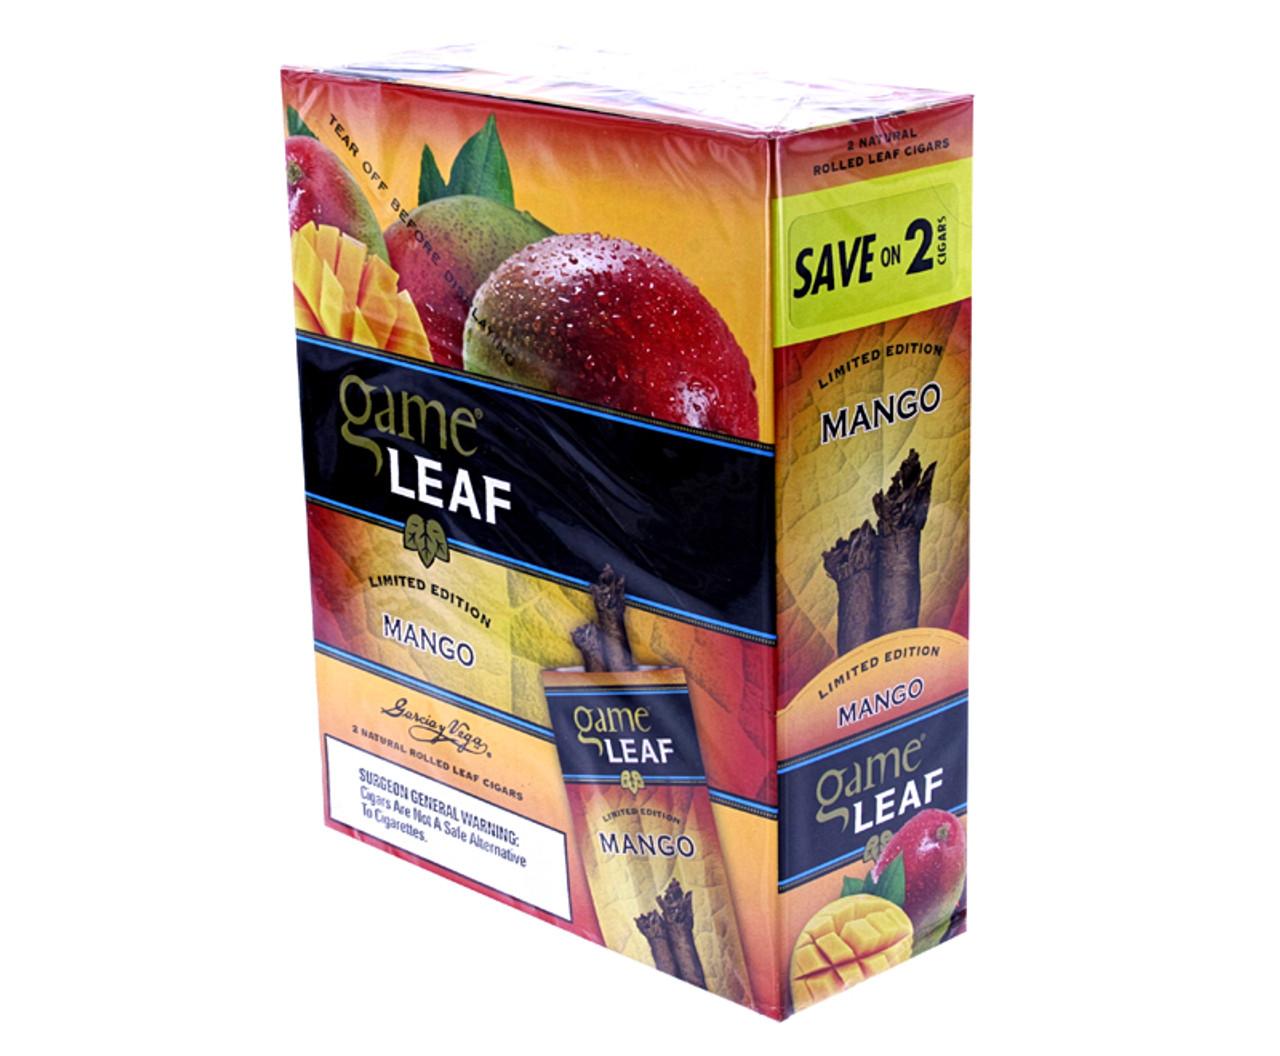 Game Leaf Cigars Mango 152